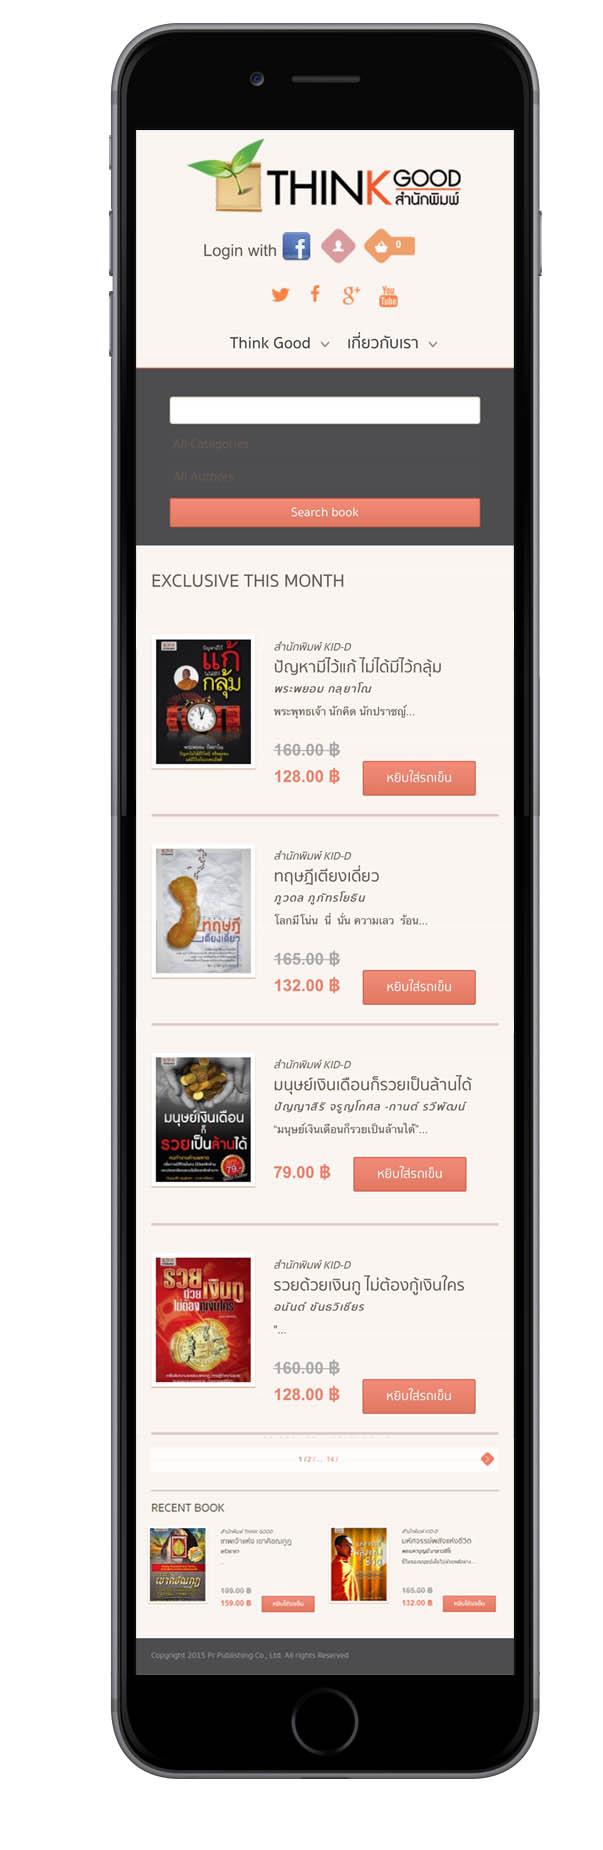 thinkgood_iphone